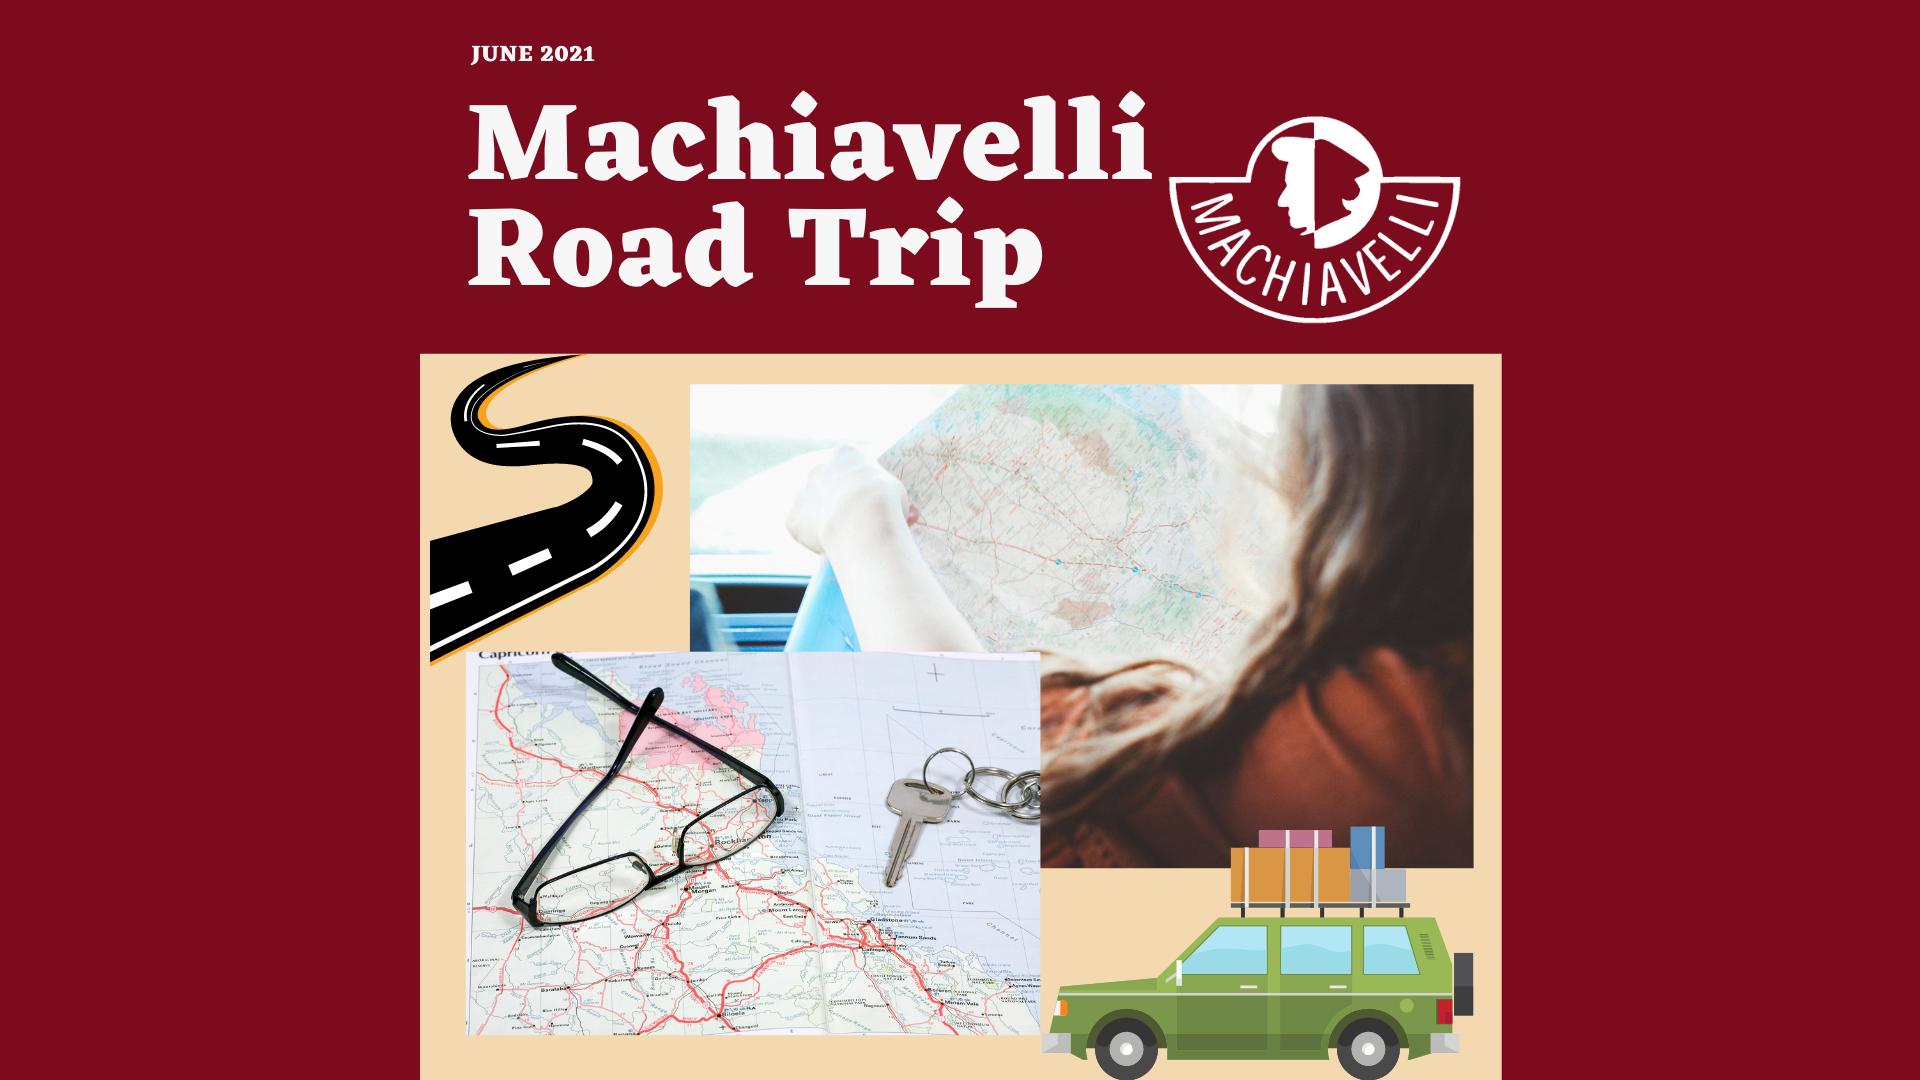 Machiavelli's Road Trip